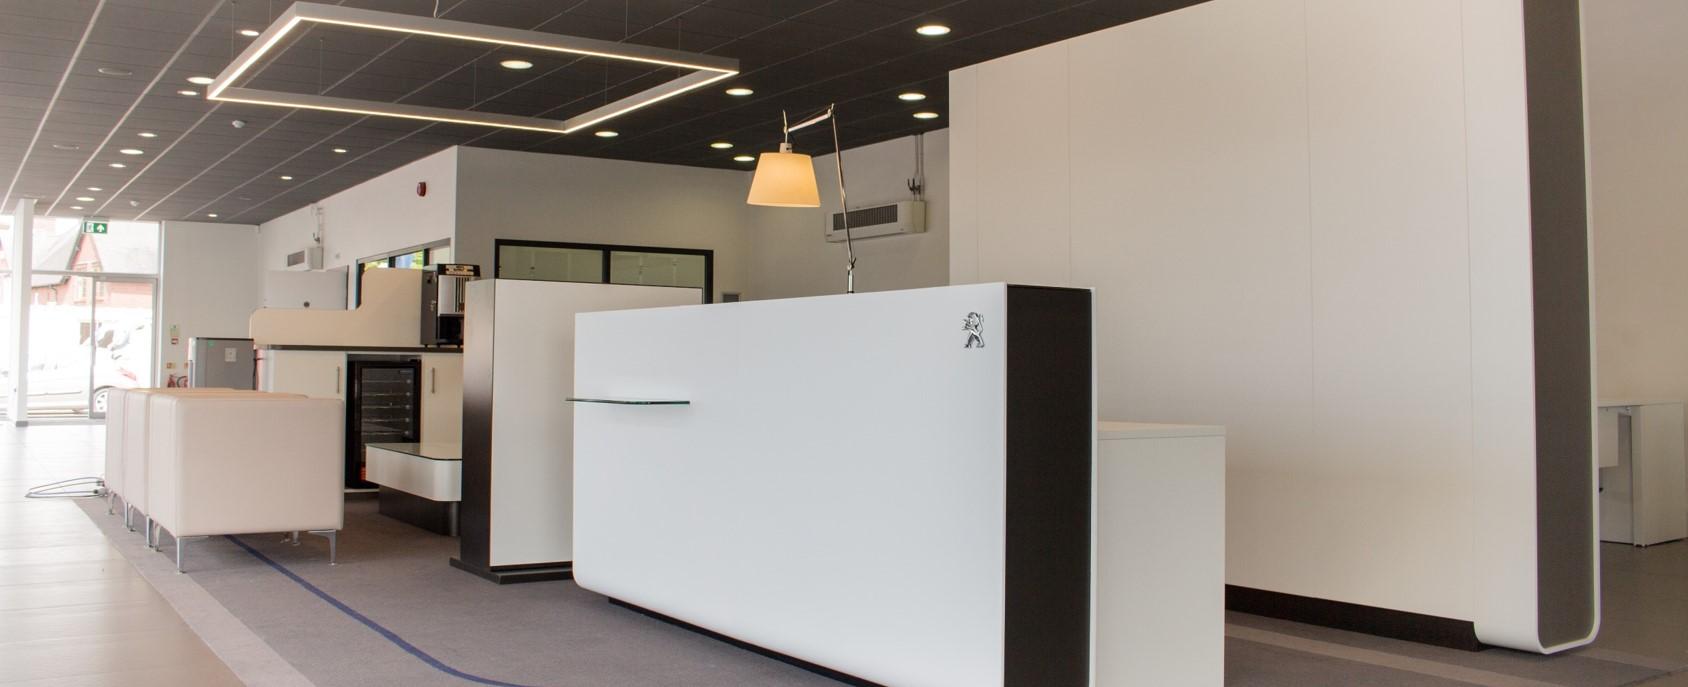 showroom interior design peugoet